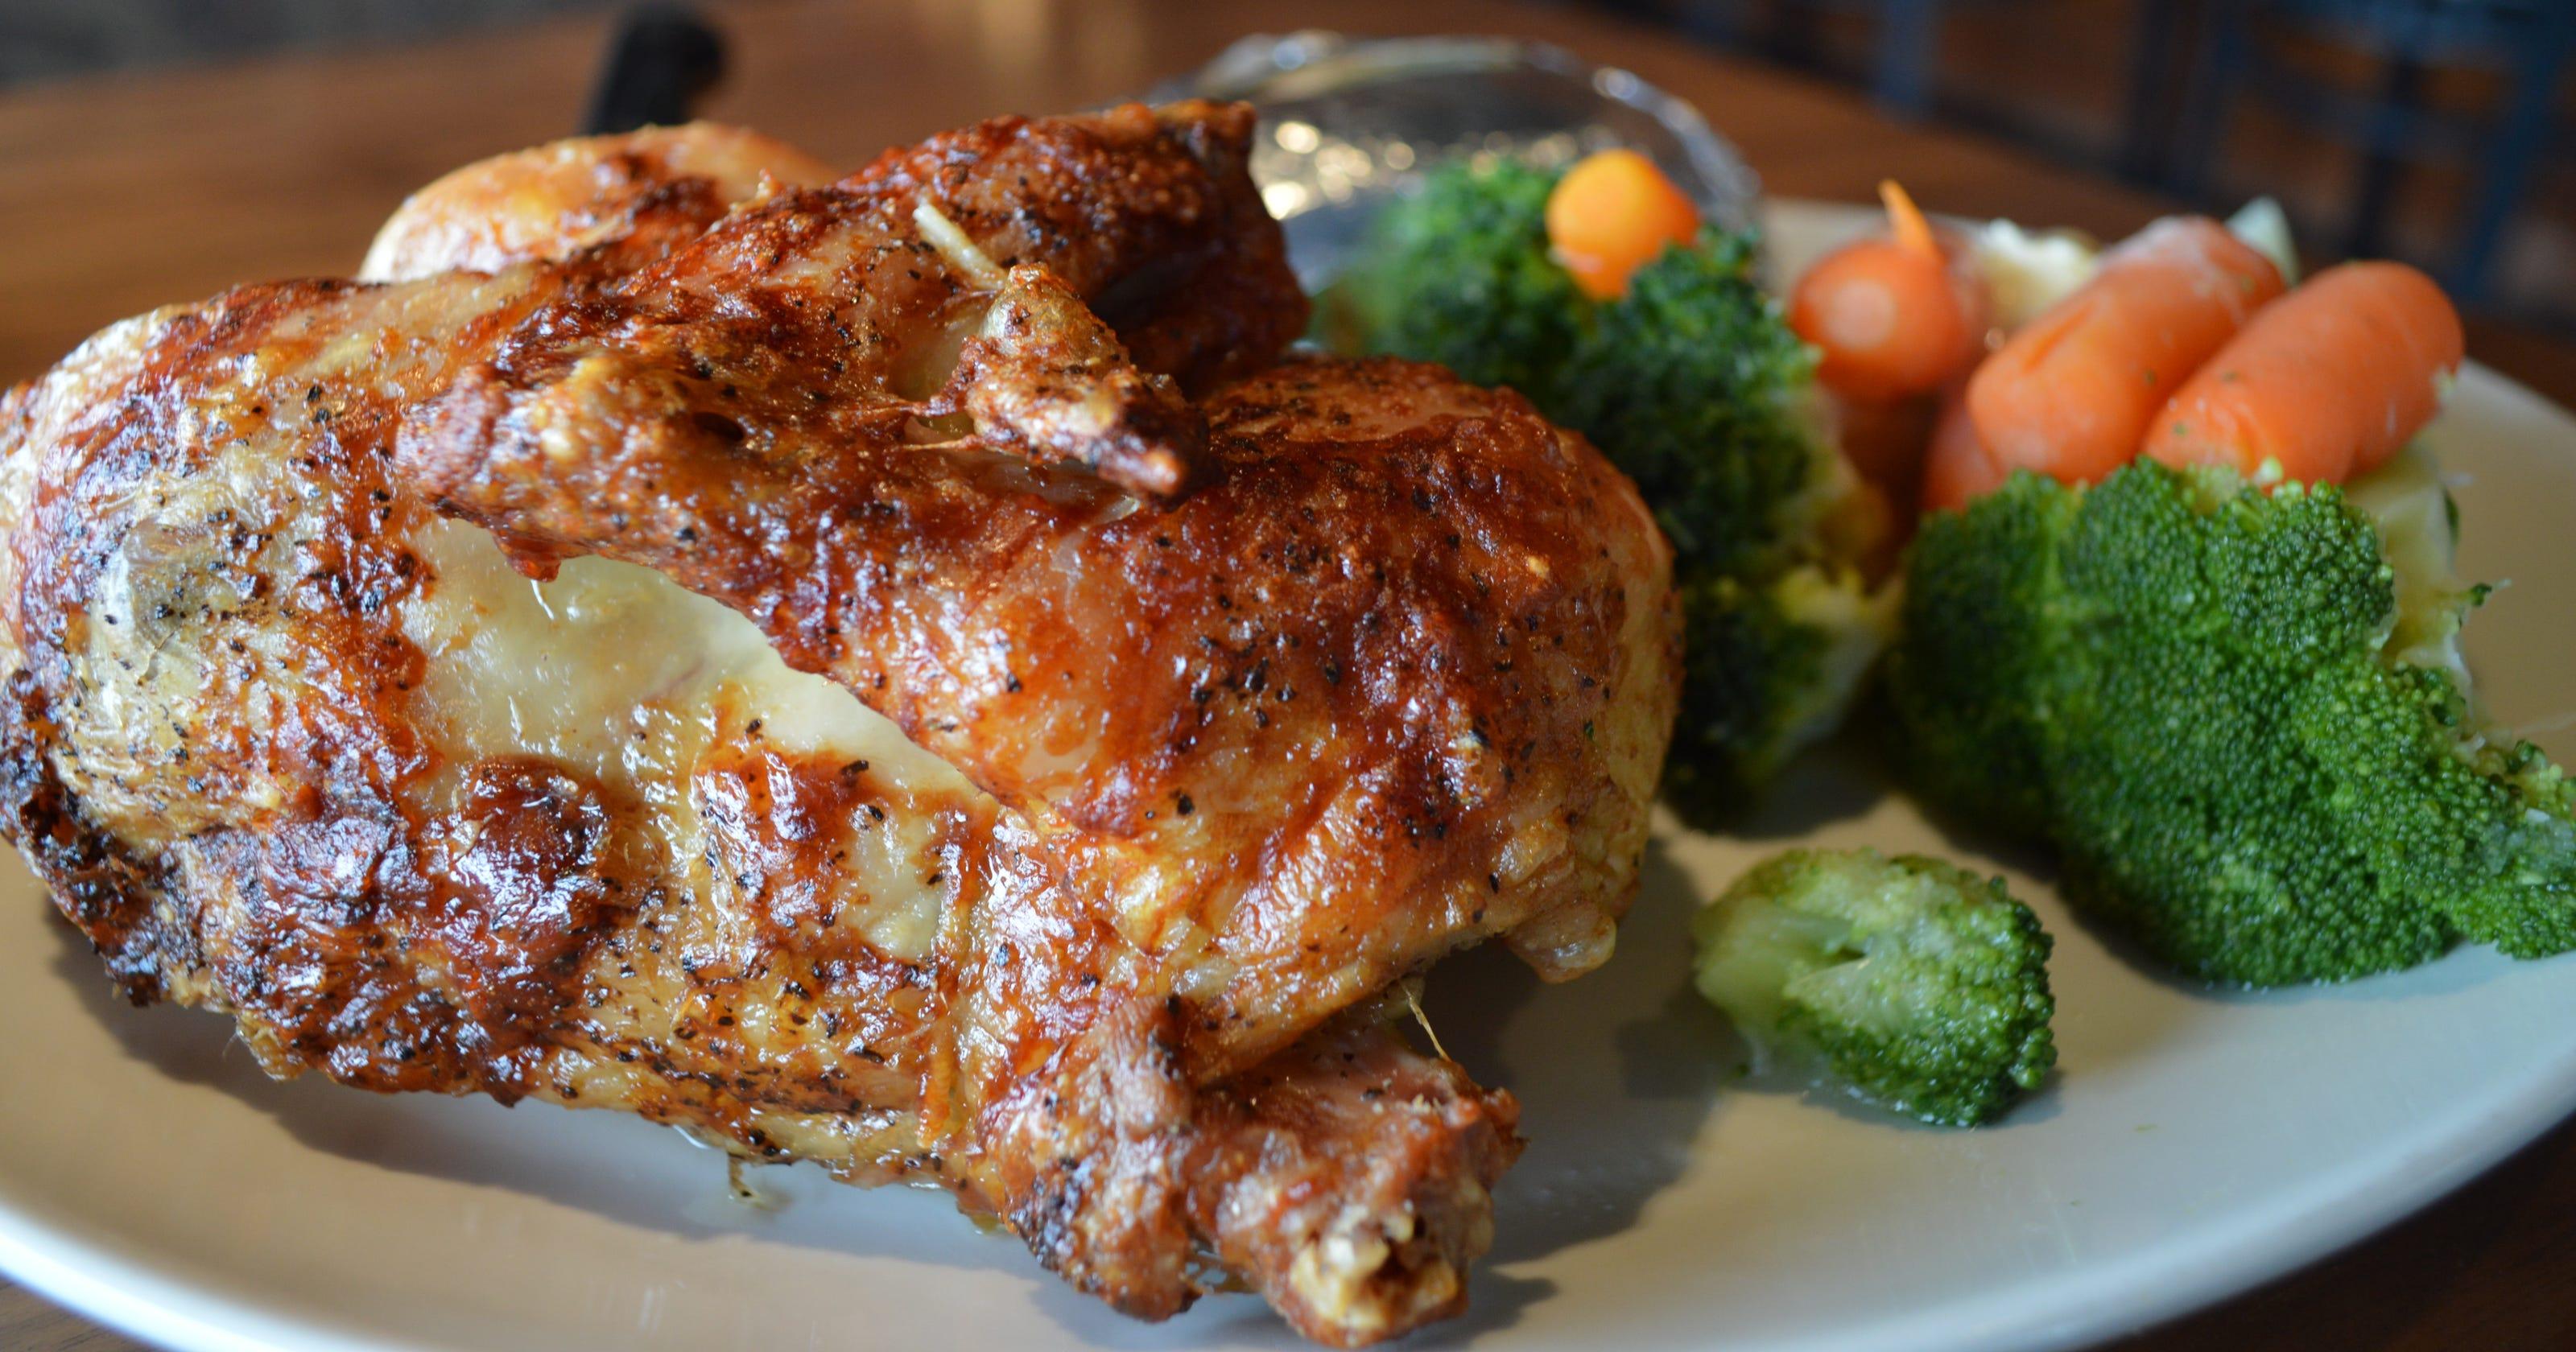 Greene County Restaurant Inspections